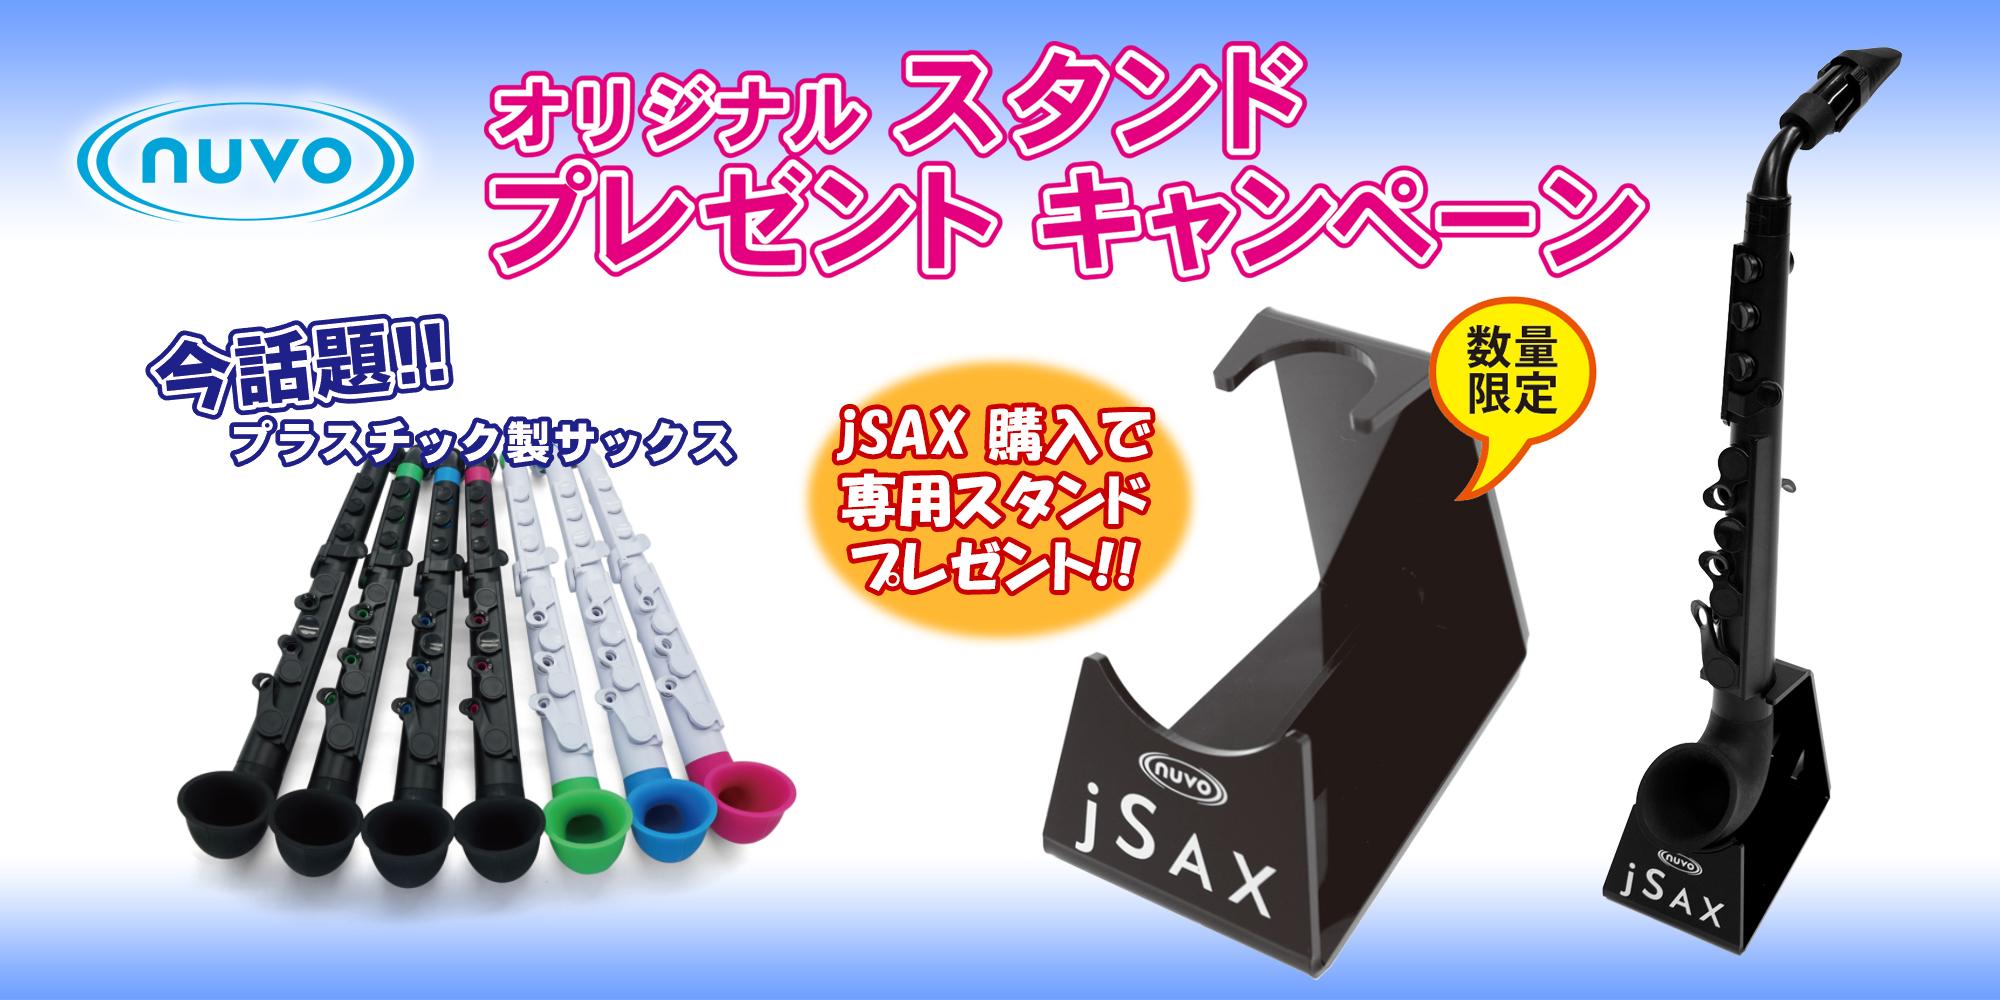 nuvo  jSAX スタンド付きキャンペーン